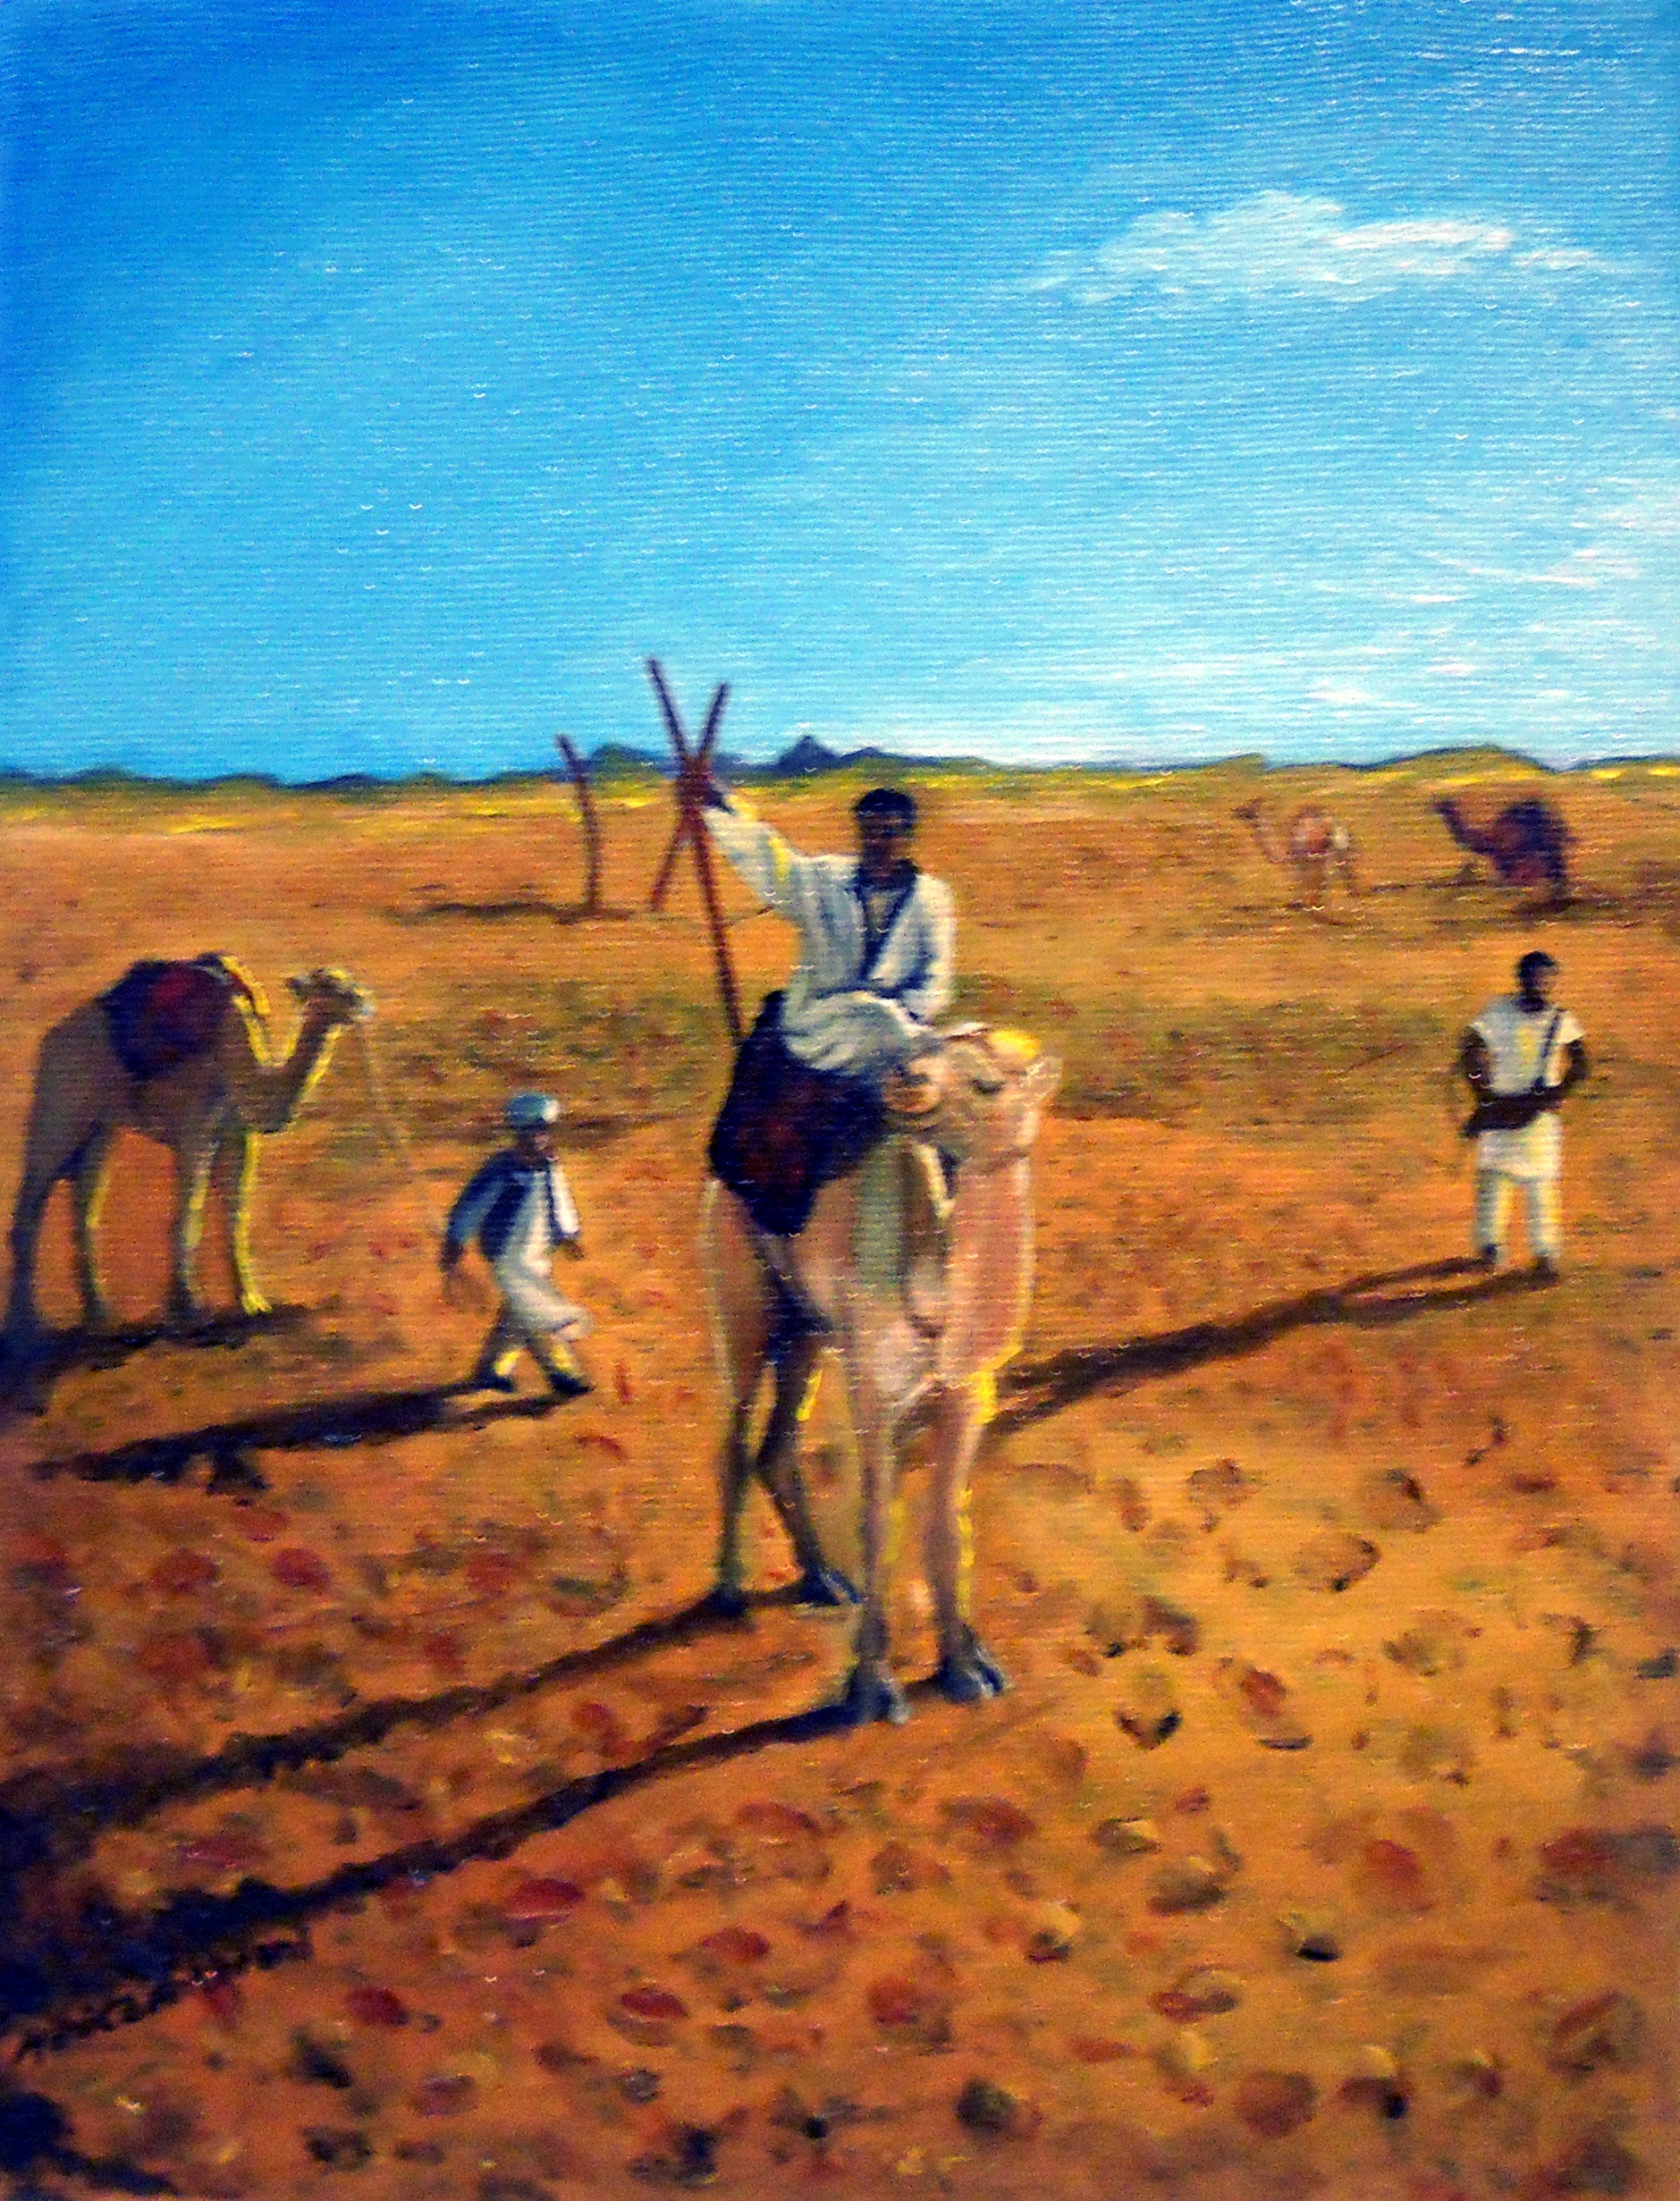 Nel Deserto